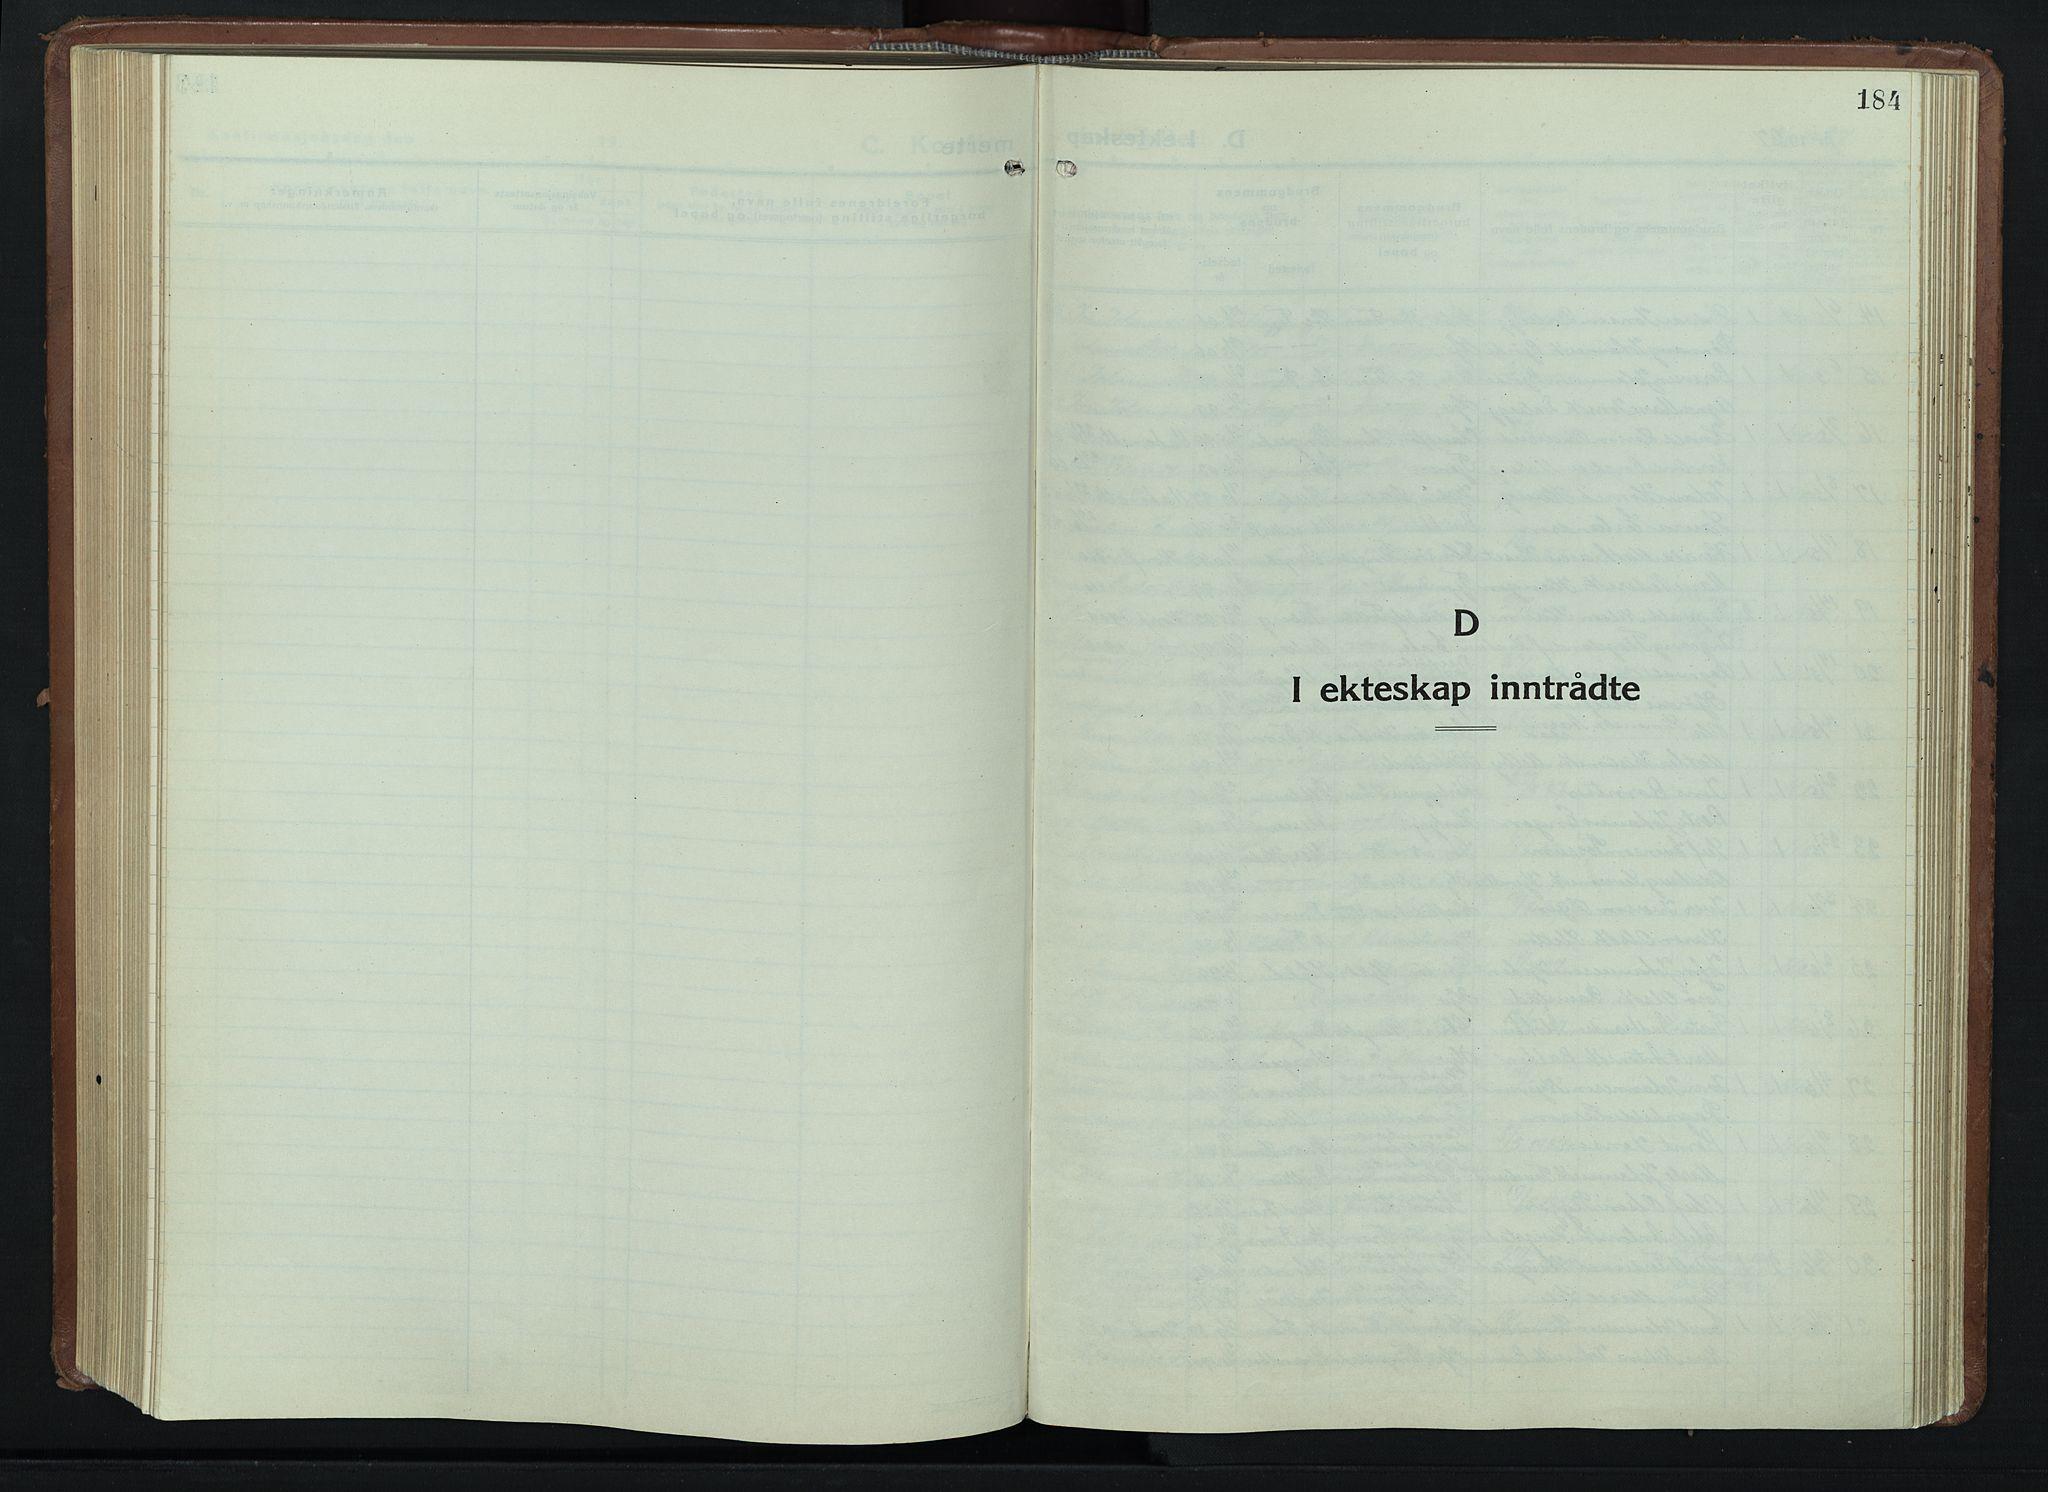 SAH, Lillehammer prestekontor, H/Ha/Hab/L0003: Parish register (copy) no. 3, 1927-1943, p. 184